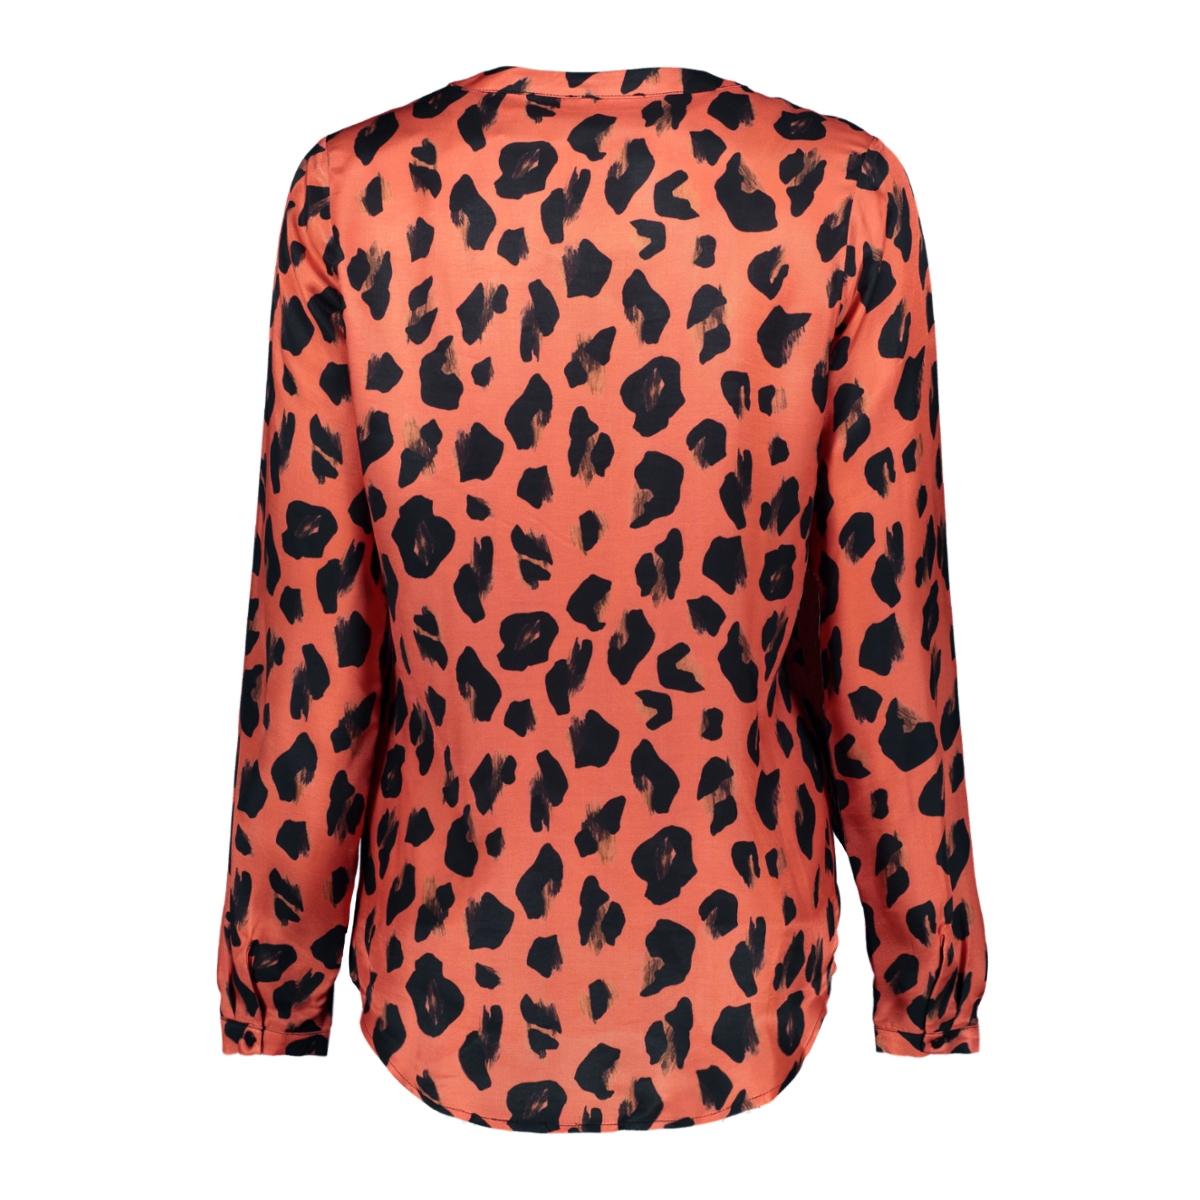 top 93955 20 geisha blouse 000220 coral/black combi